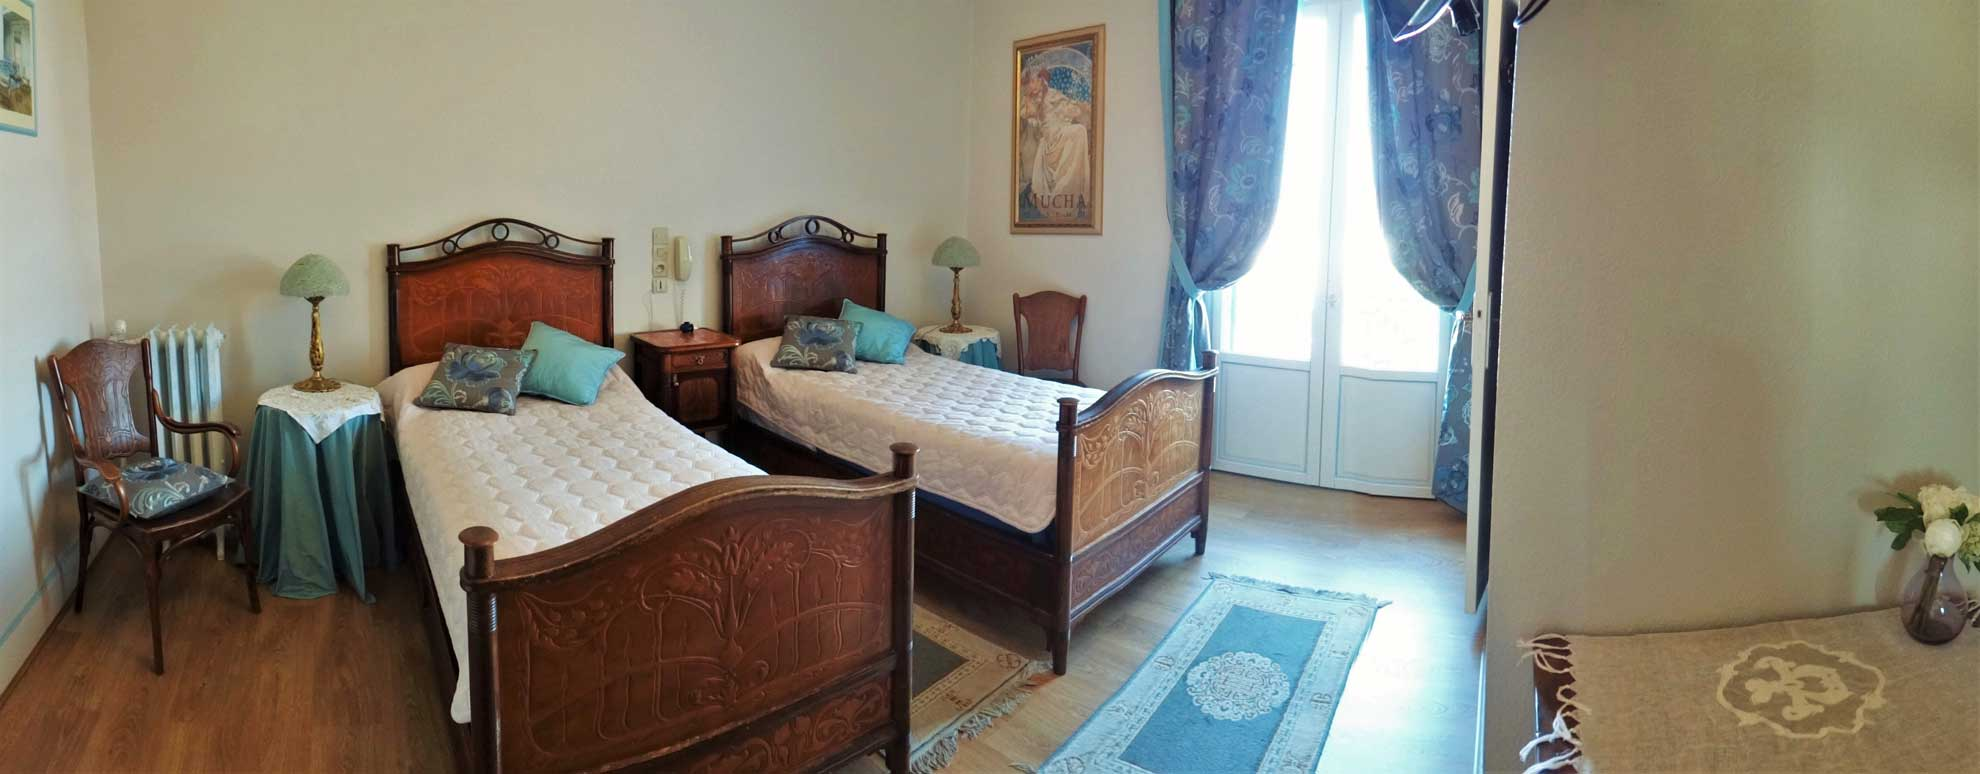 chambre-hotel-marceillac-a-castelsarrasin